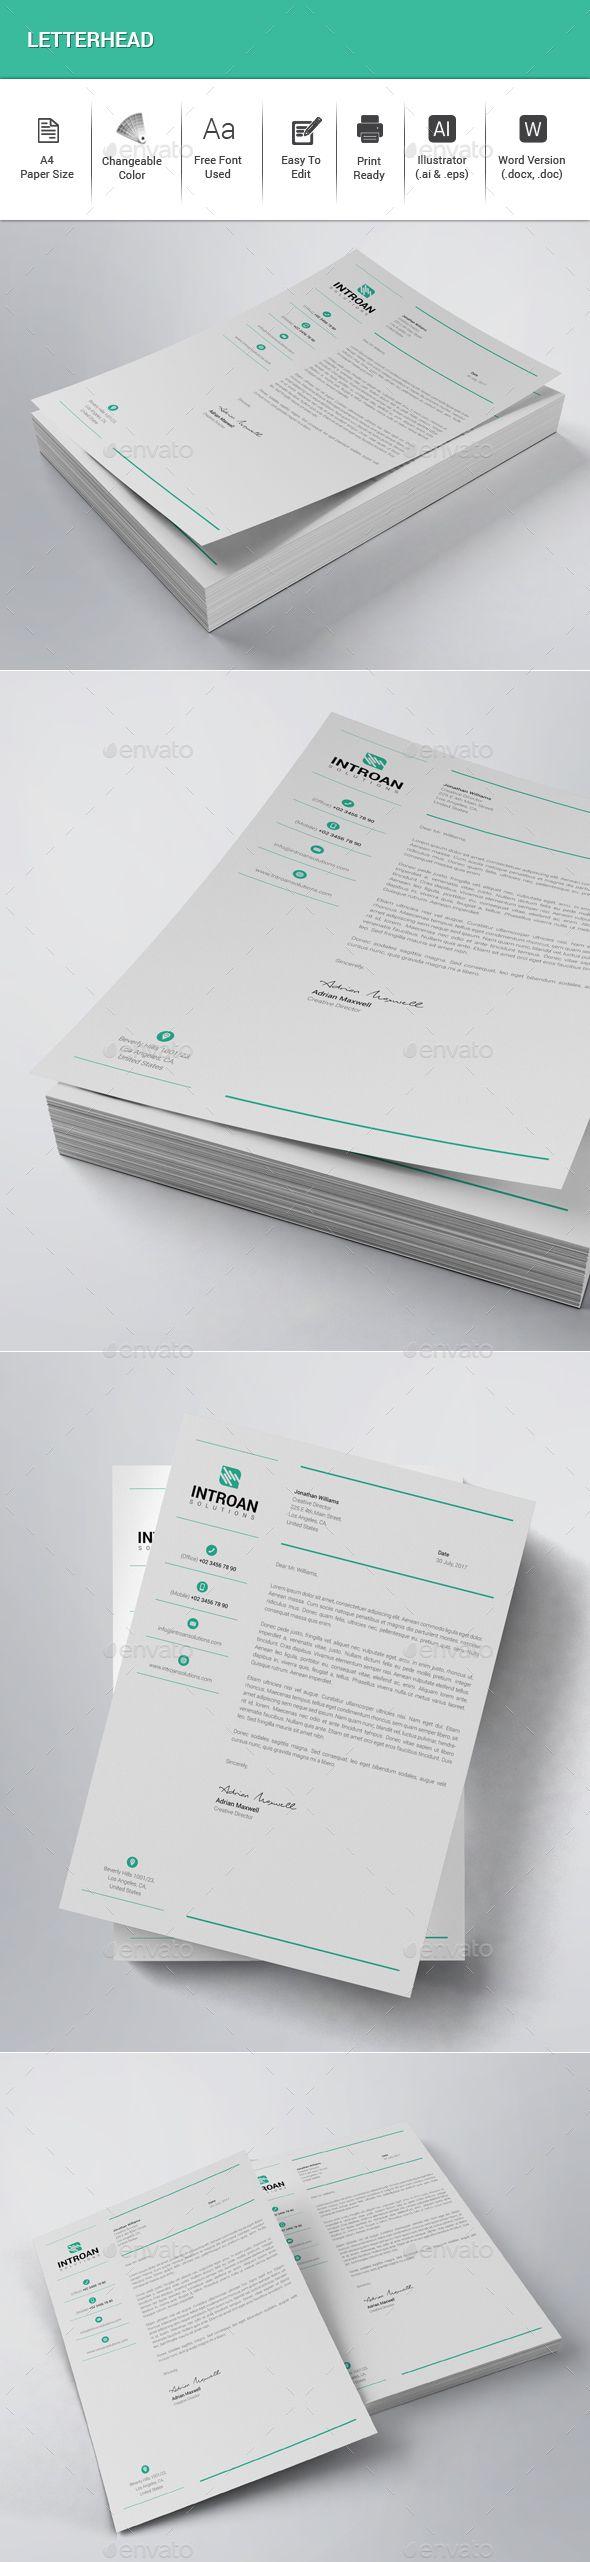 Letterhead Stationery Print Templates 232 best